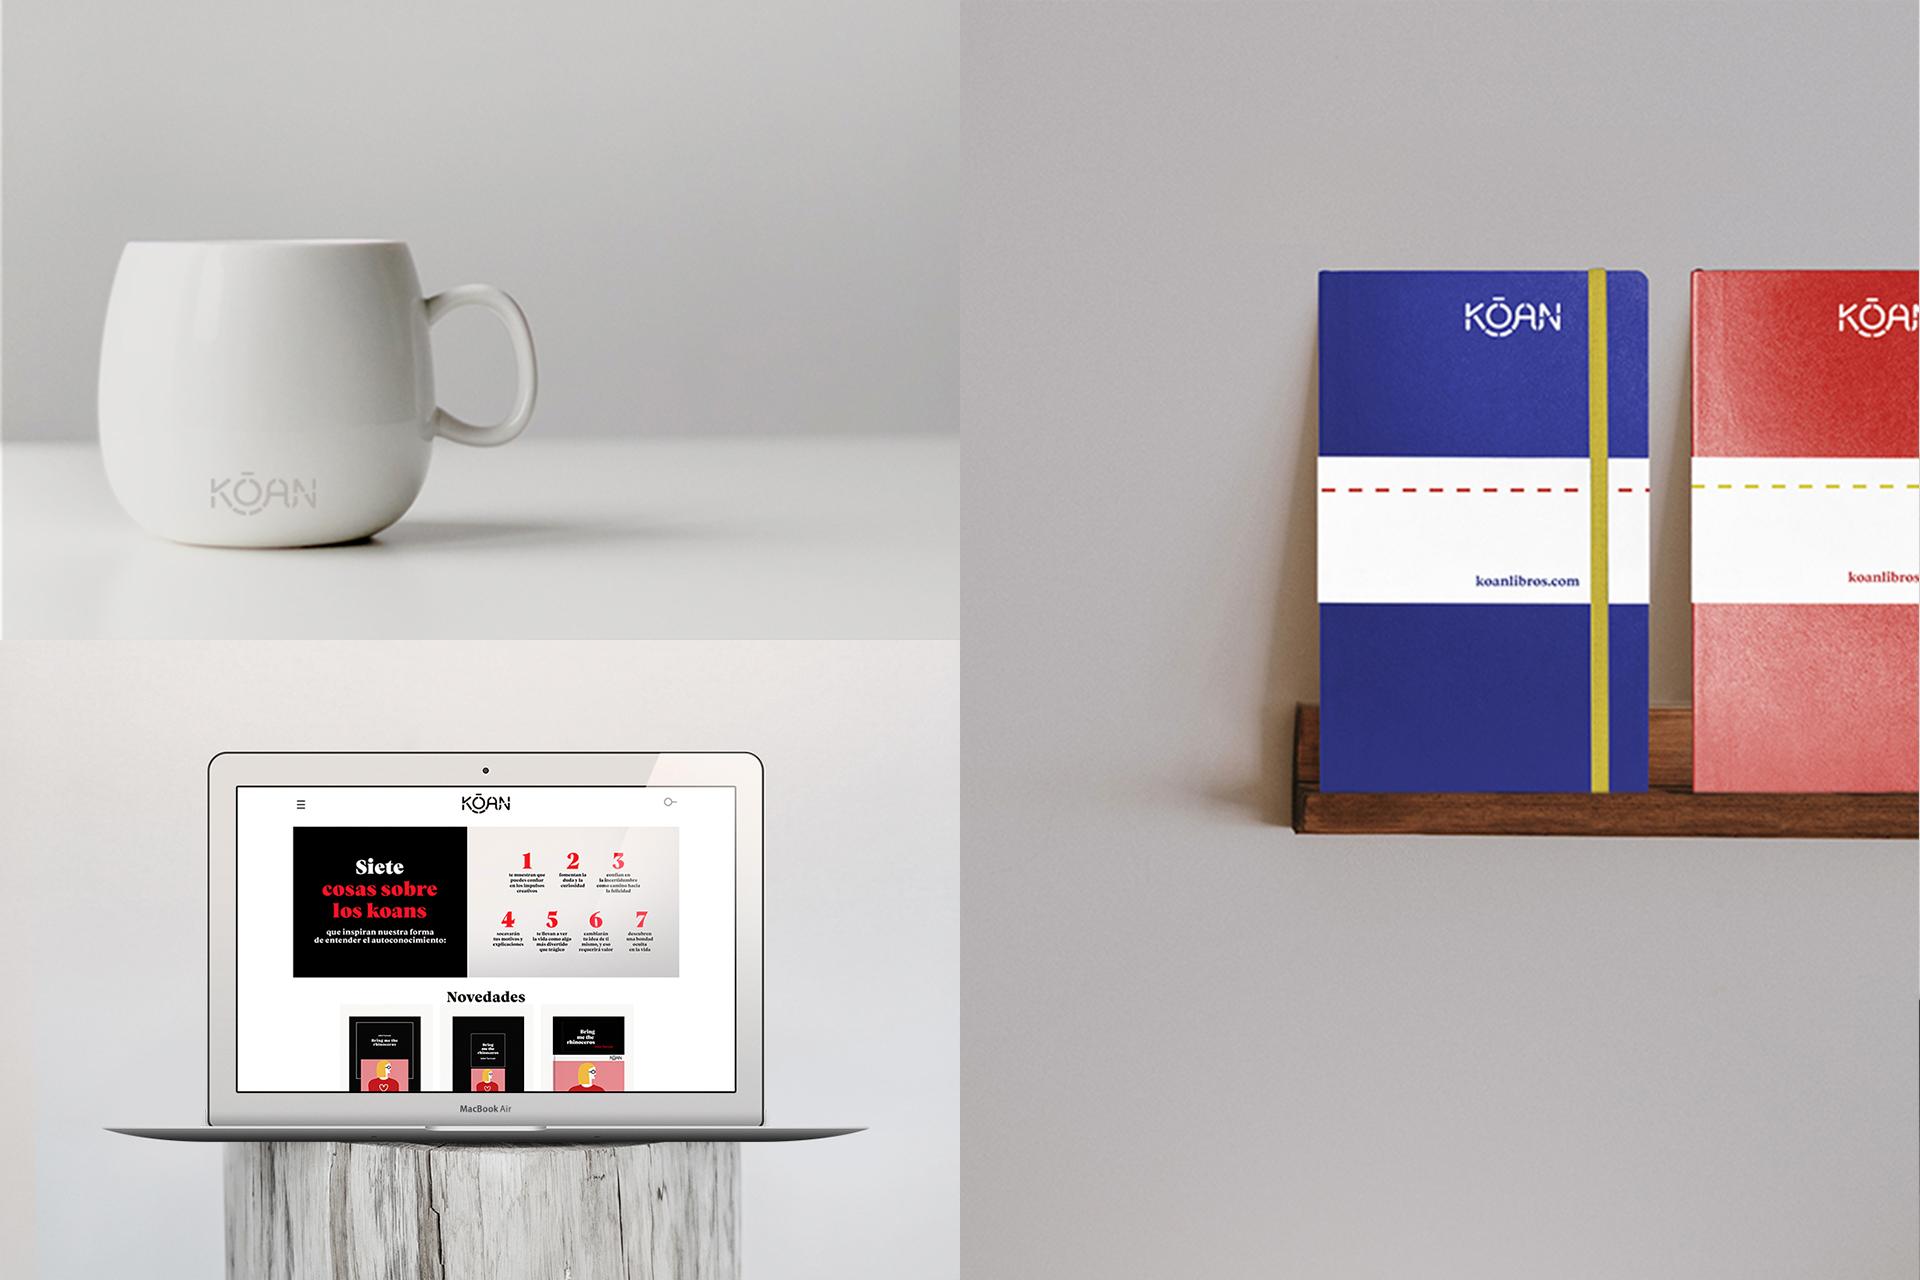 Kōan (Editorial independiente) Branding & Web by Silenceworks - Creative Work - $i